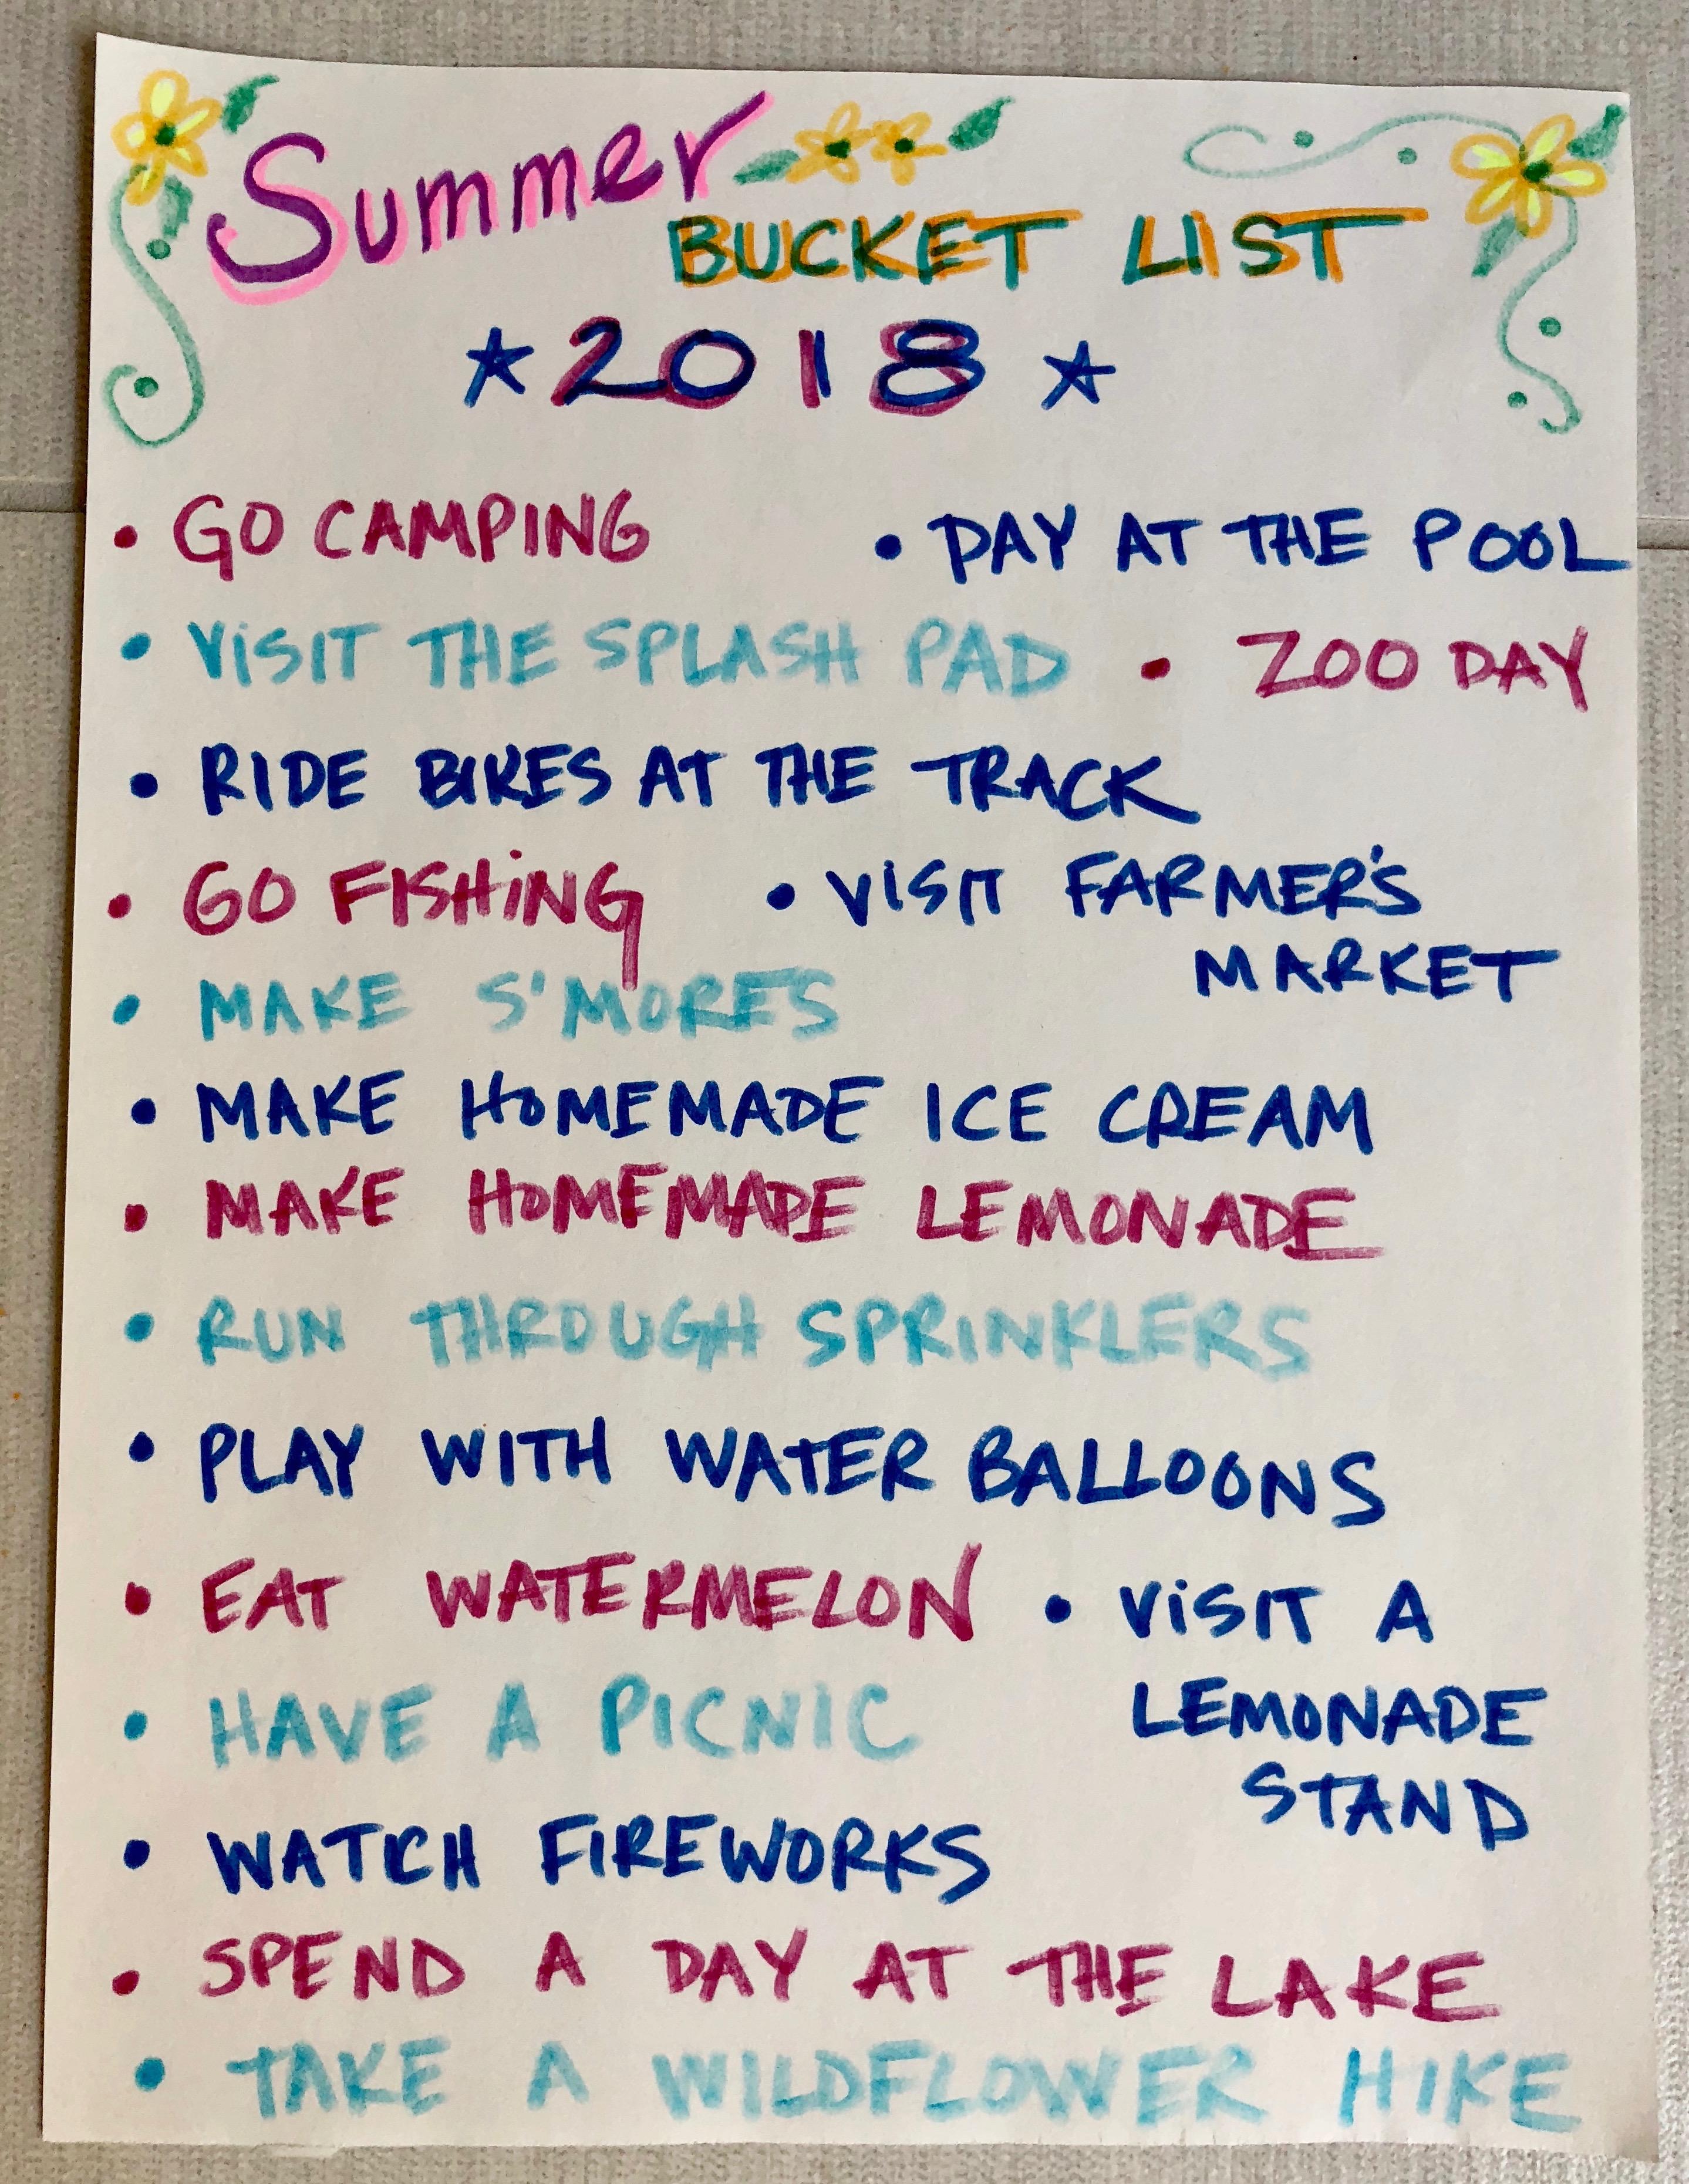 Summer Bucket List Recap The Usual Bliss